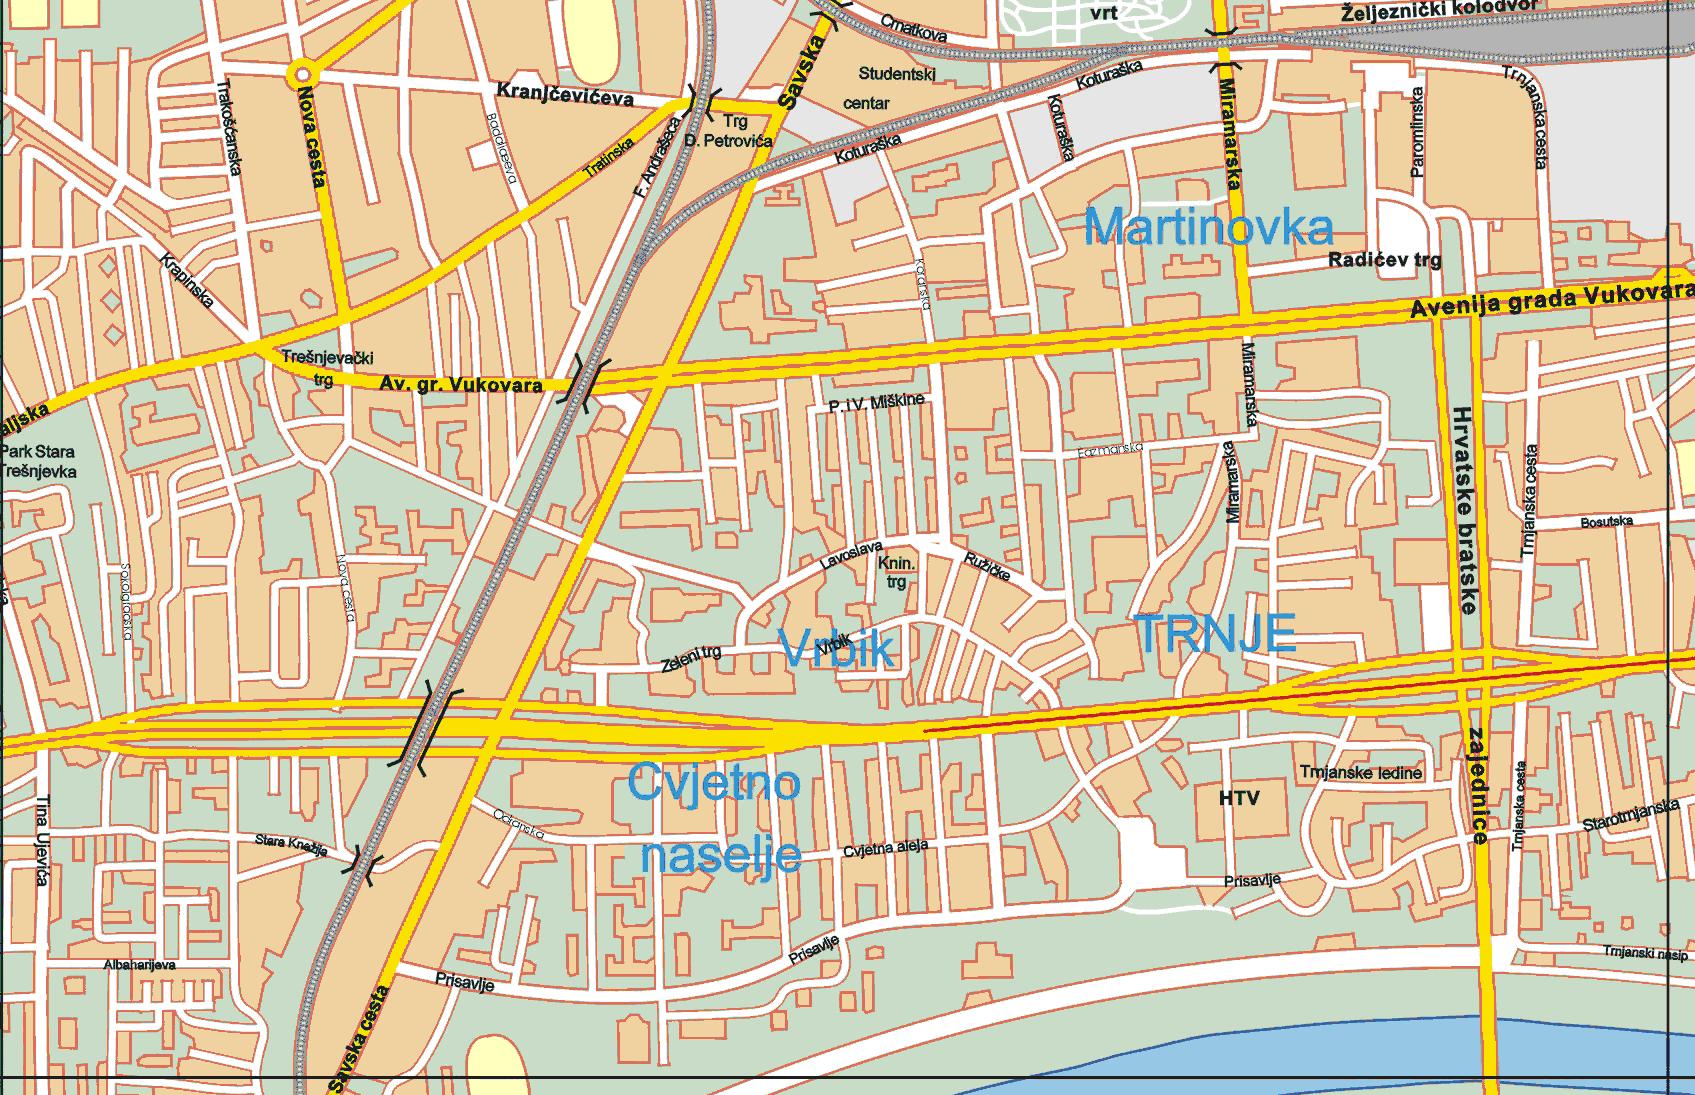 Glazbena karta grada zagreba ivan zajc thecheapjerseys Images